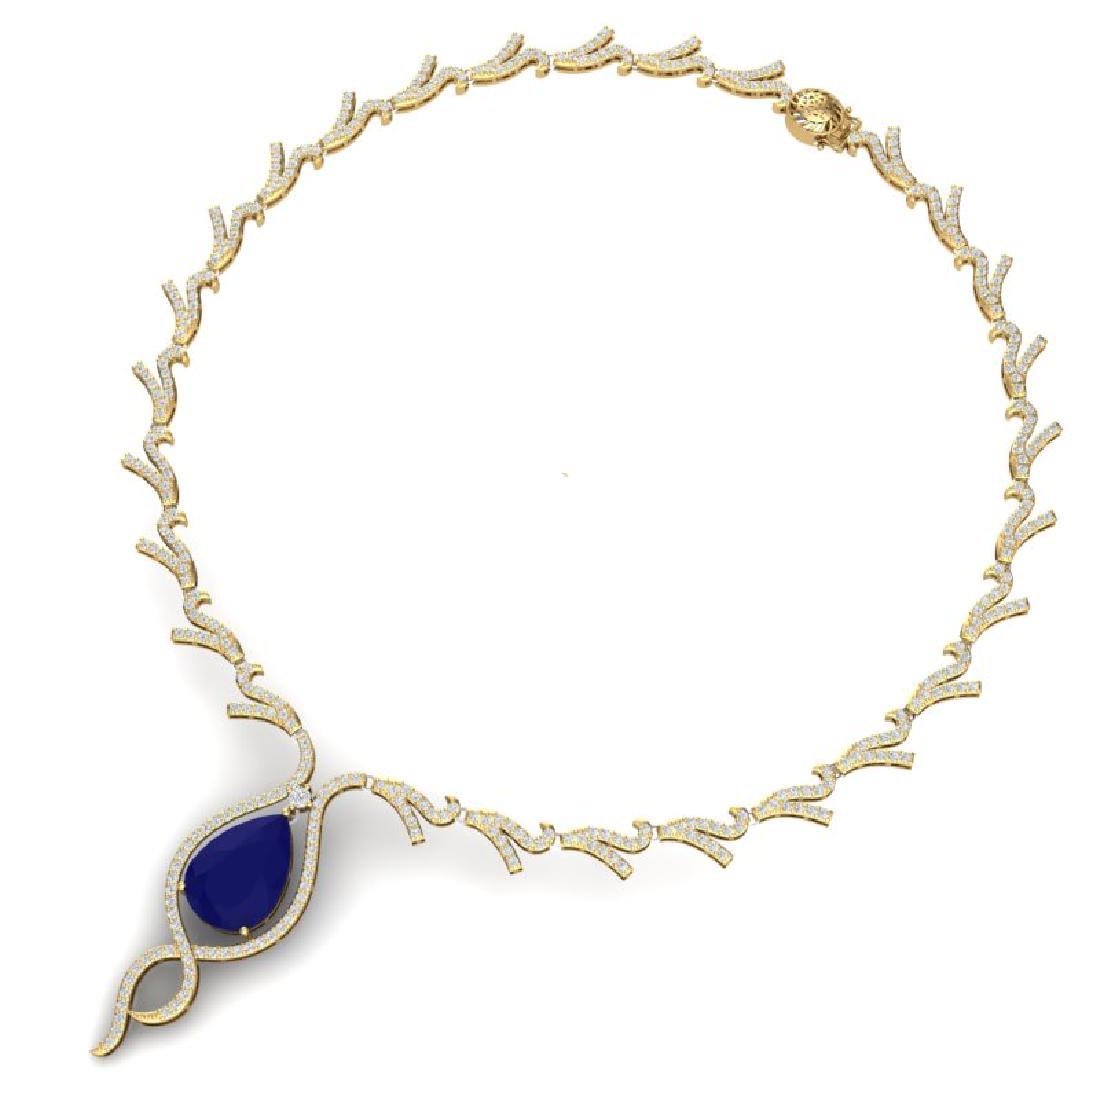 23.43 CTW Royalty Sapphire & VS Diamond Necklace 18K - 3